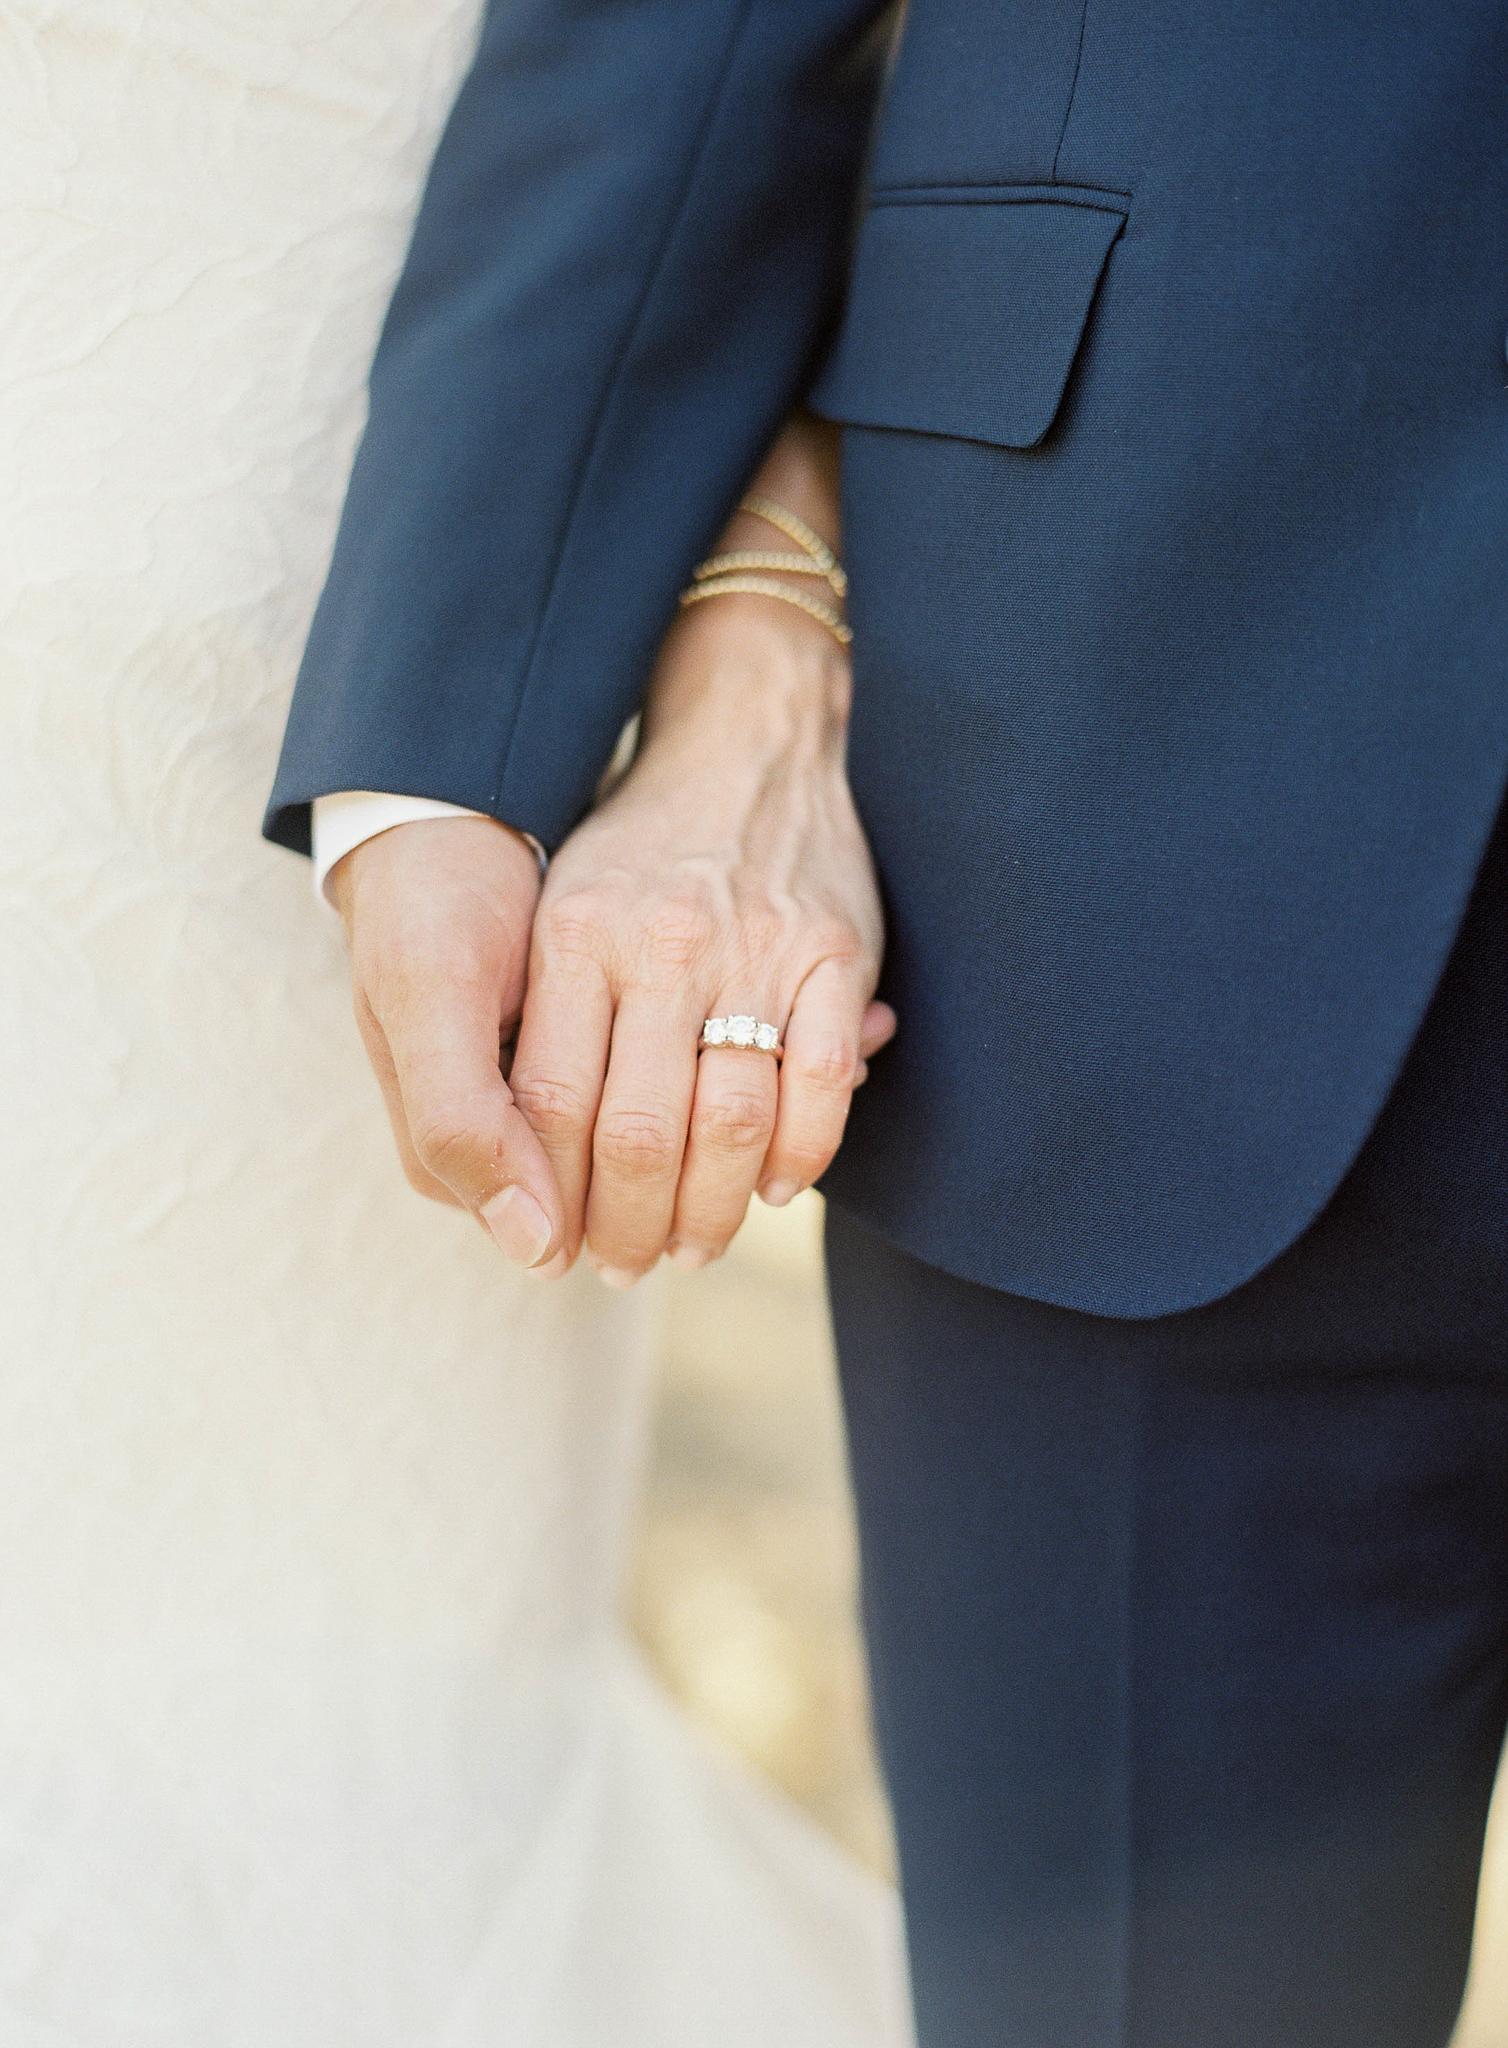 Meghan Mehan Photography - Fine Art Film Wedding Photography - San Francisco   Napa   Sonoma   Big Sur   Chicago   Minneapolis   Milwaukee   Lake Geneva   Door County   Wisconsin 048.jpg